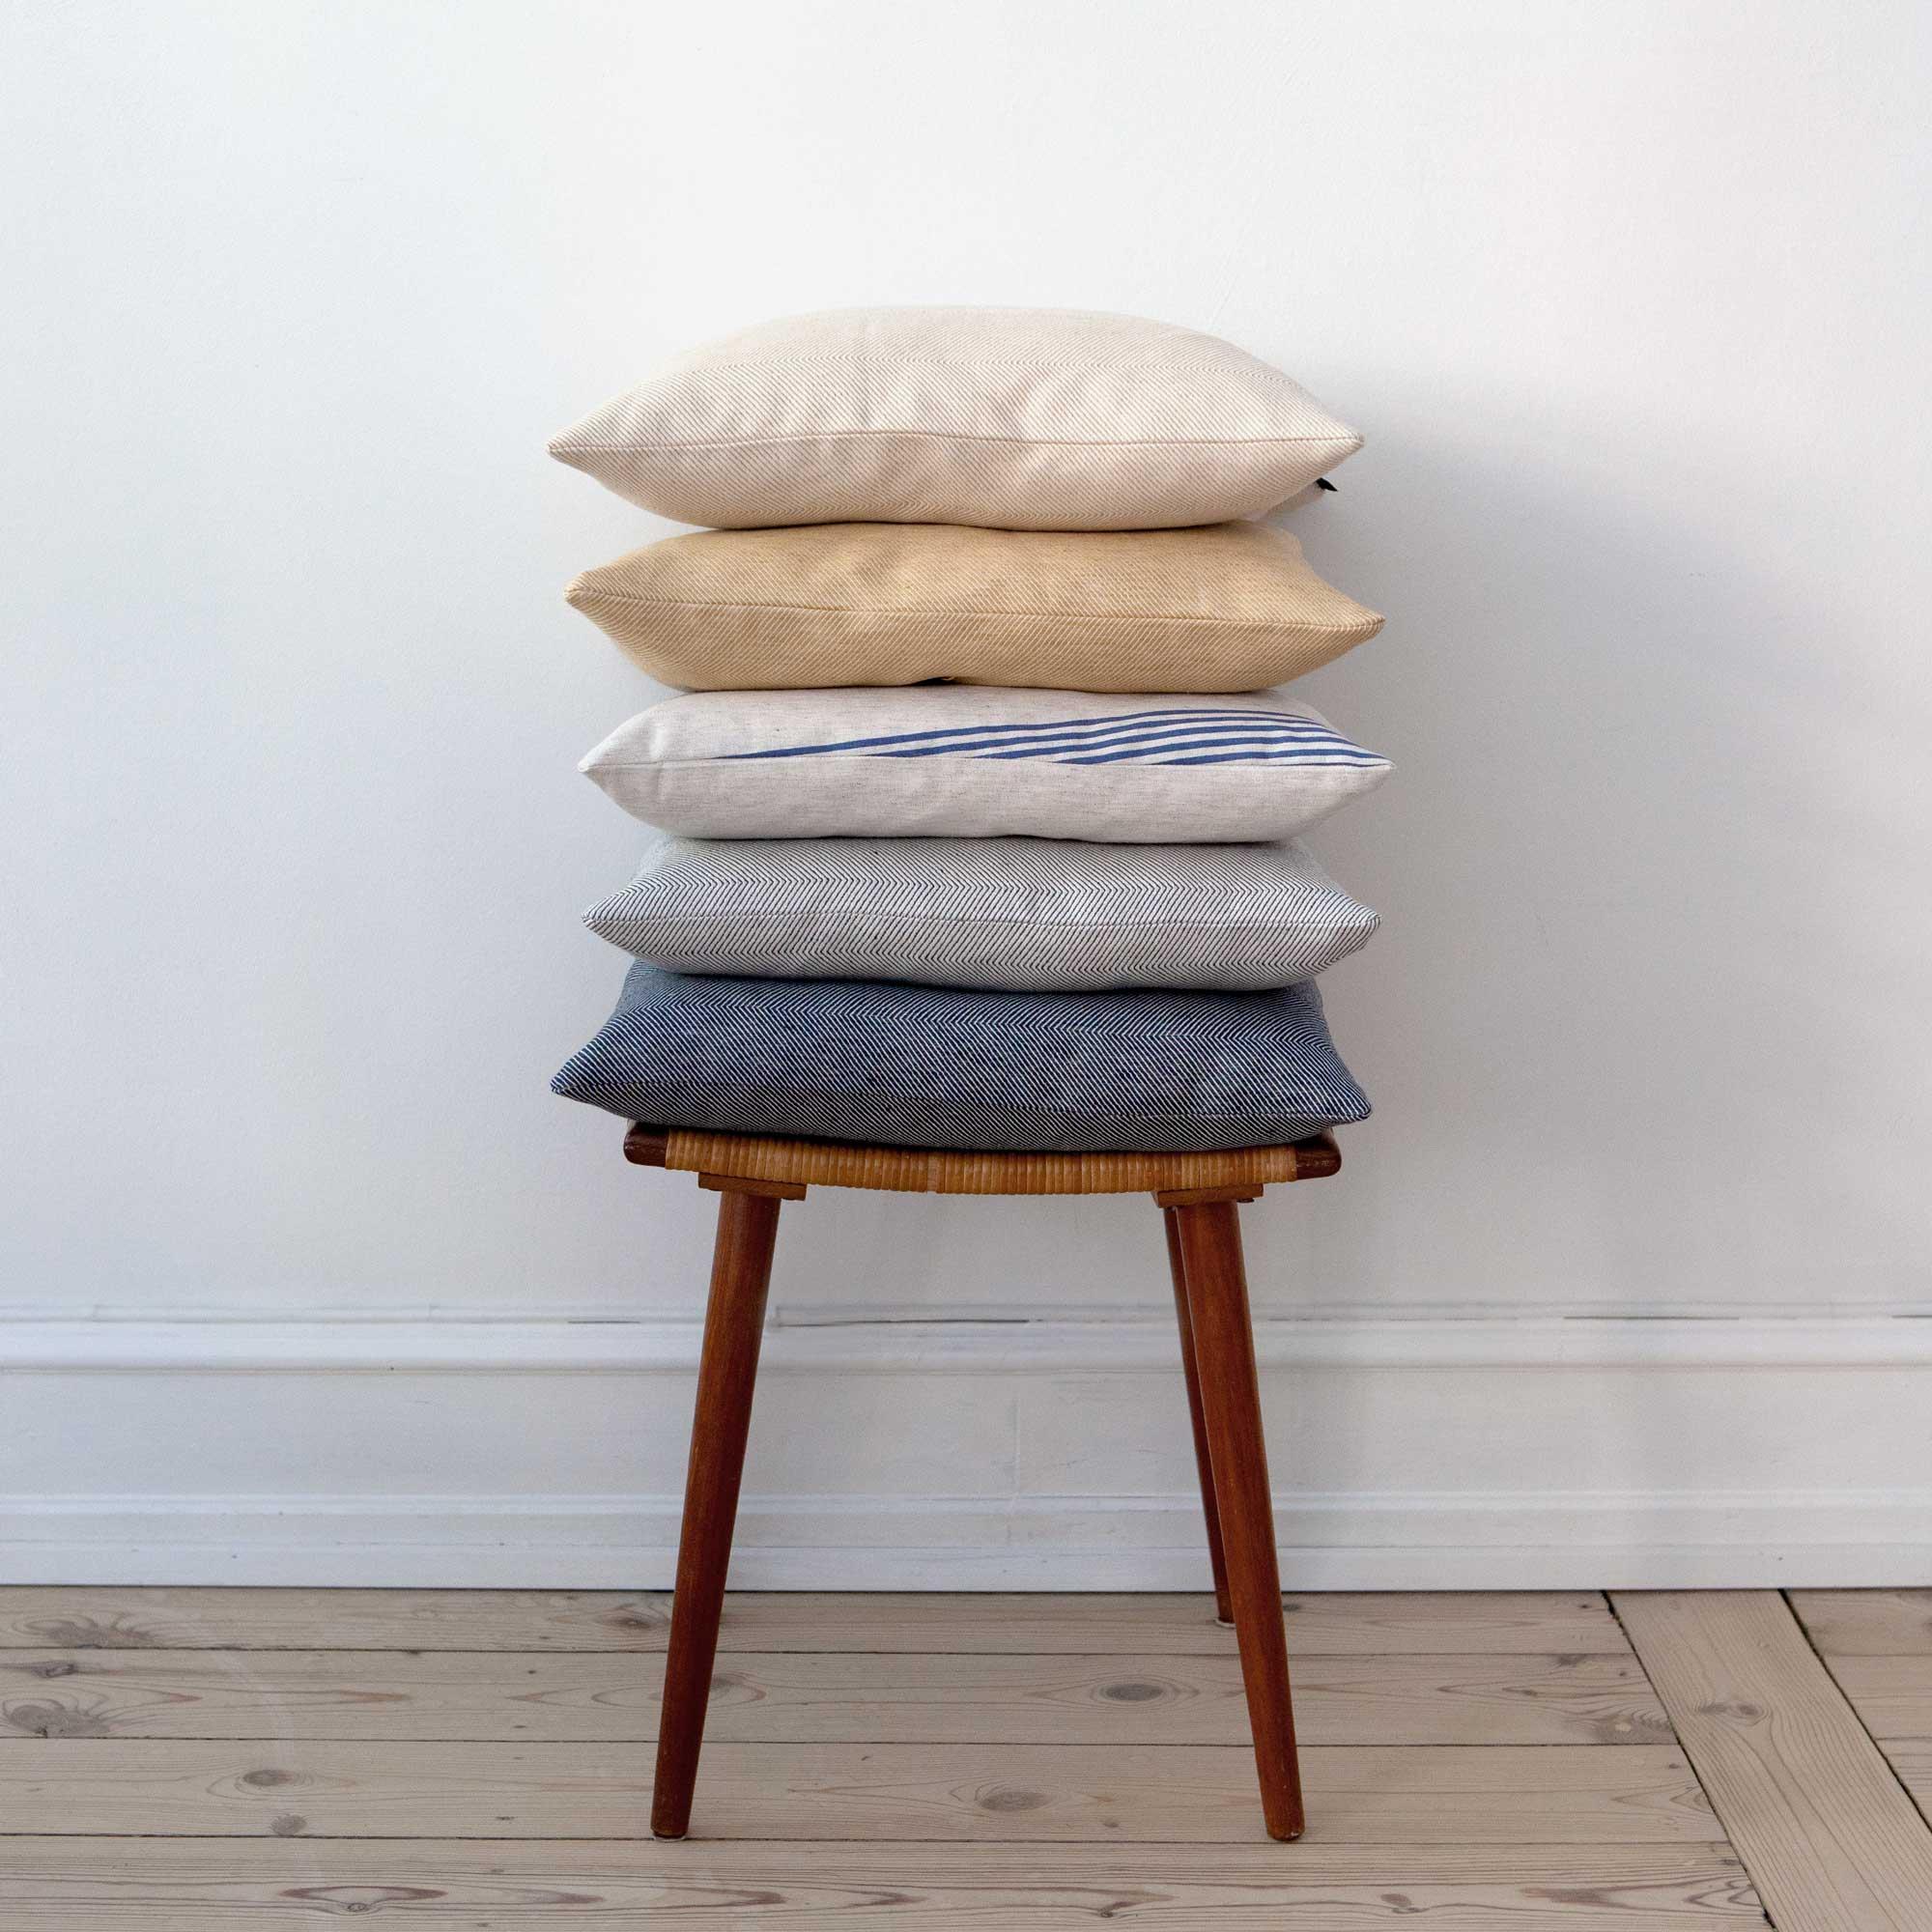 Square cushions in river pattern, hay yellow and indigo herringbone weave, design by Anne Rosenberg, RosenbergCph